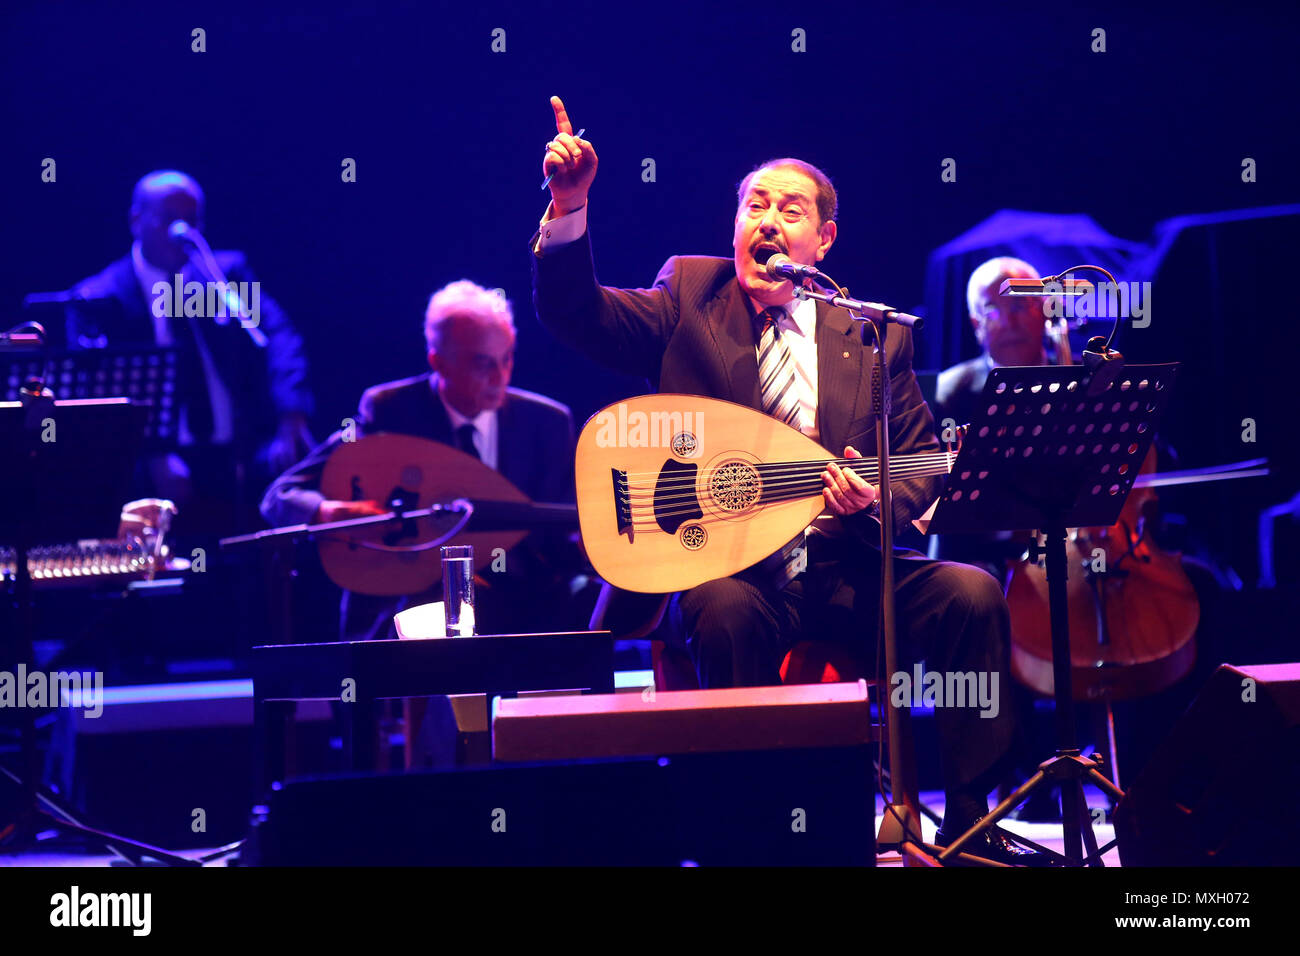 Beirut, Lebanon  4th June, 2018  Tunisian singer Lutfi